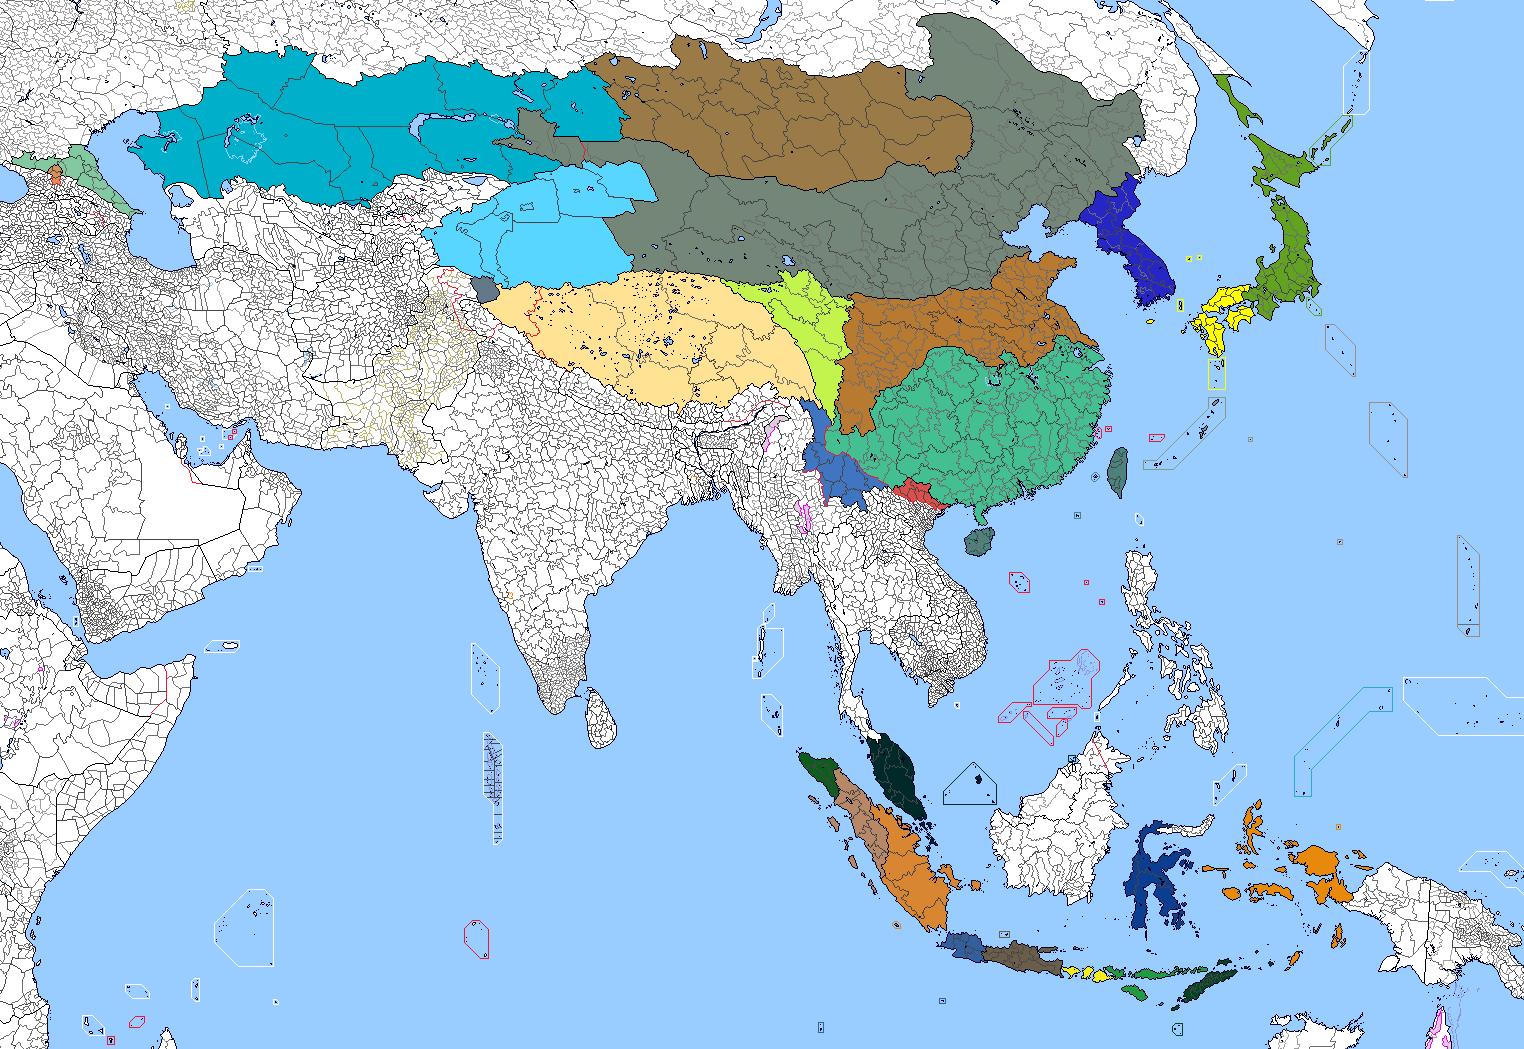 American Medditeranean Asia WIP.png